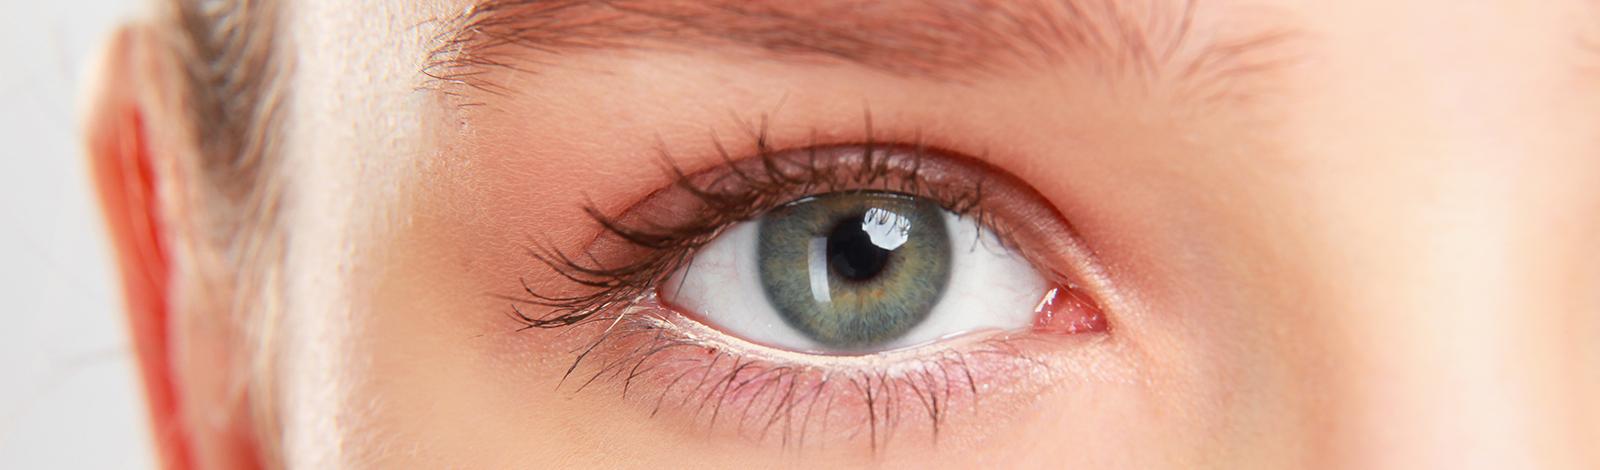 Oogzorg oog